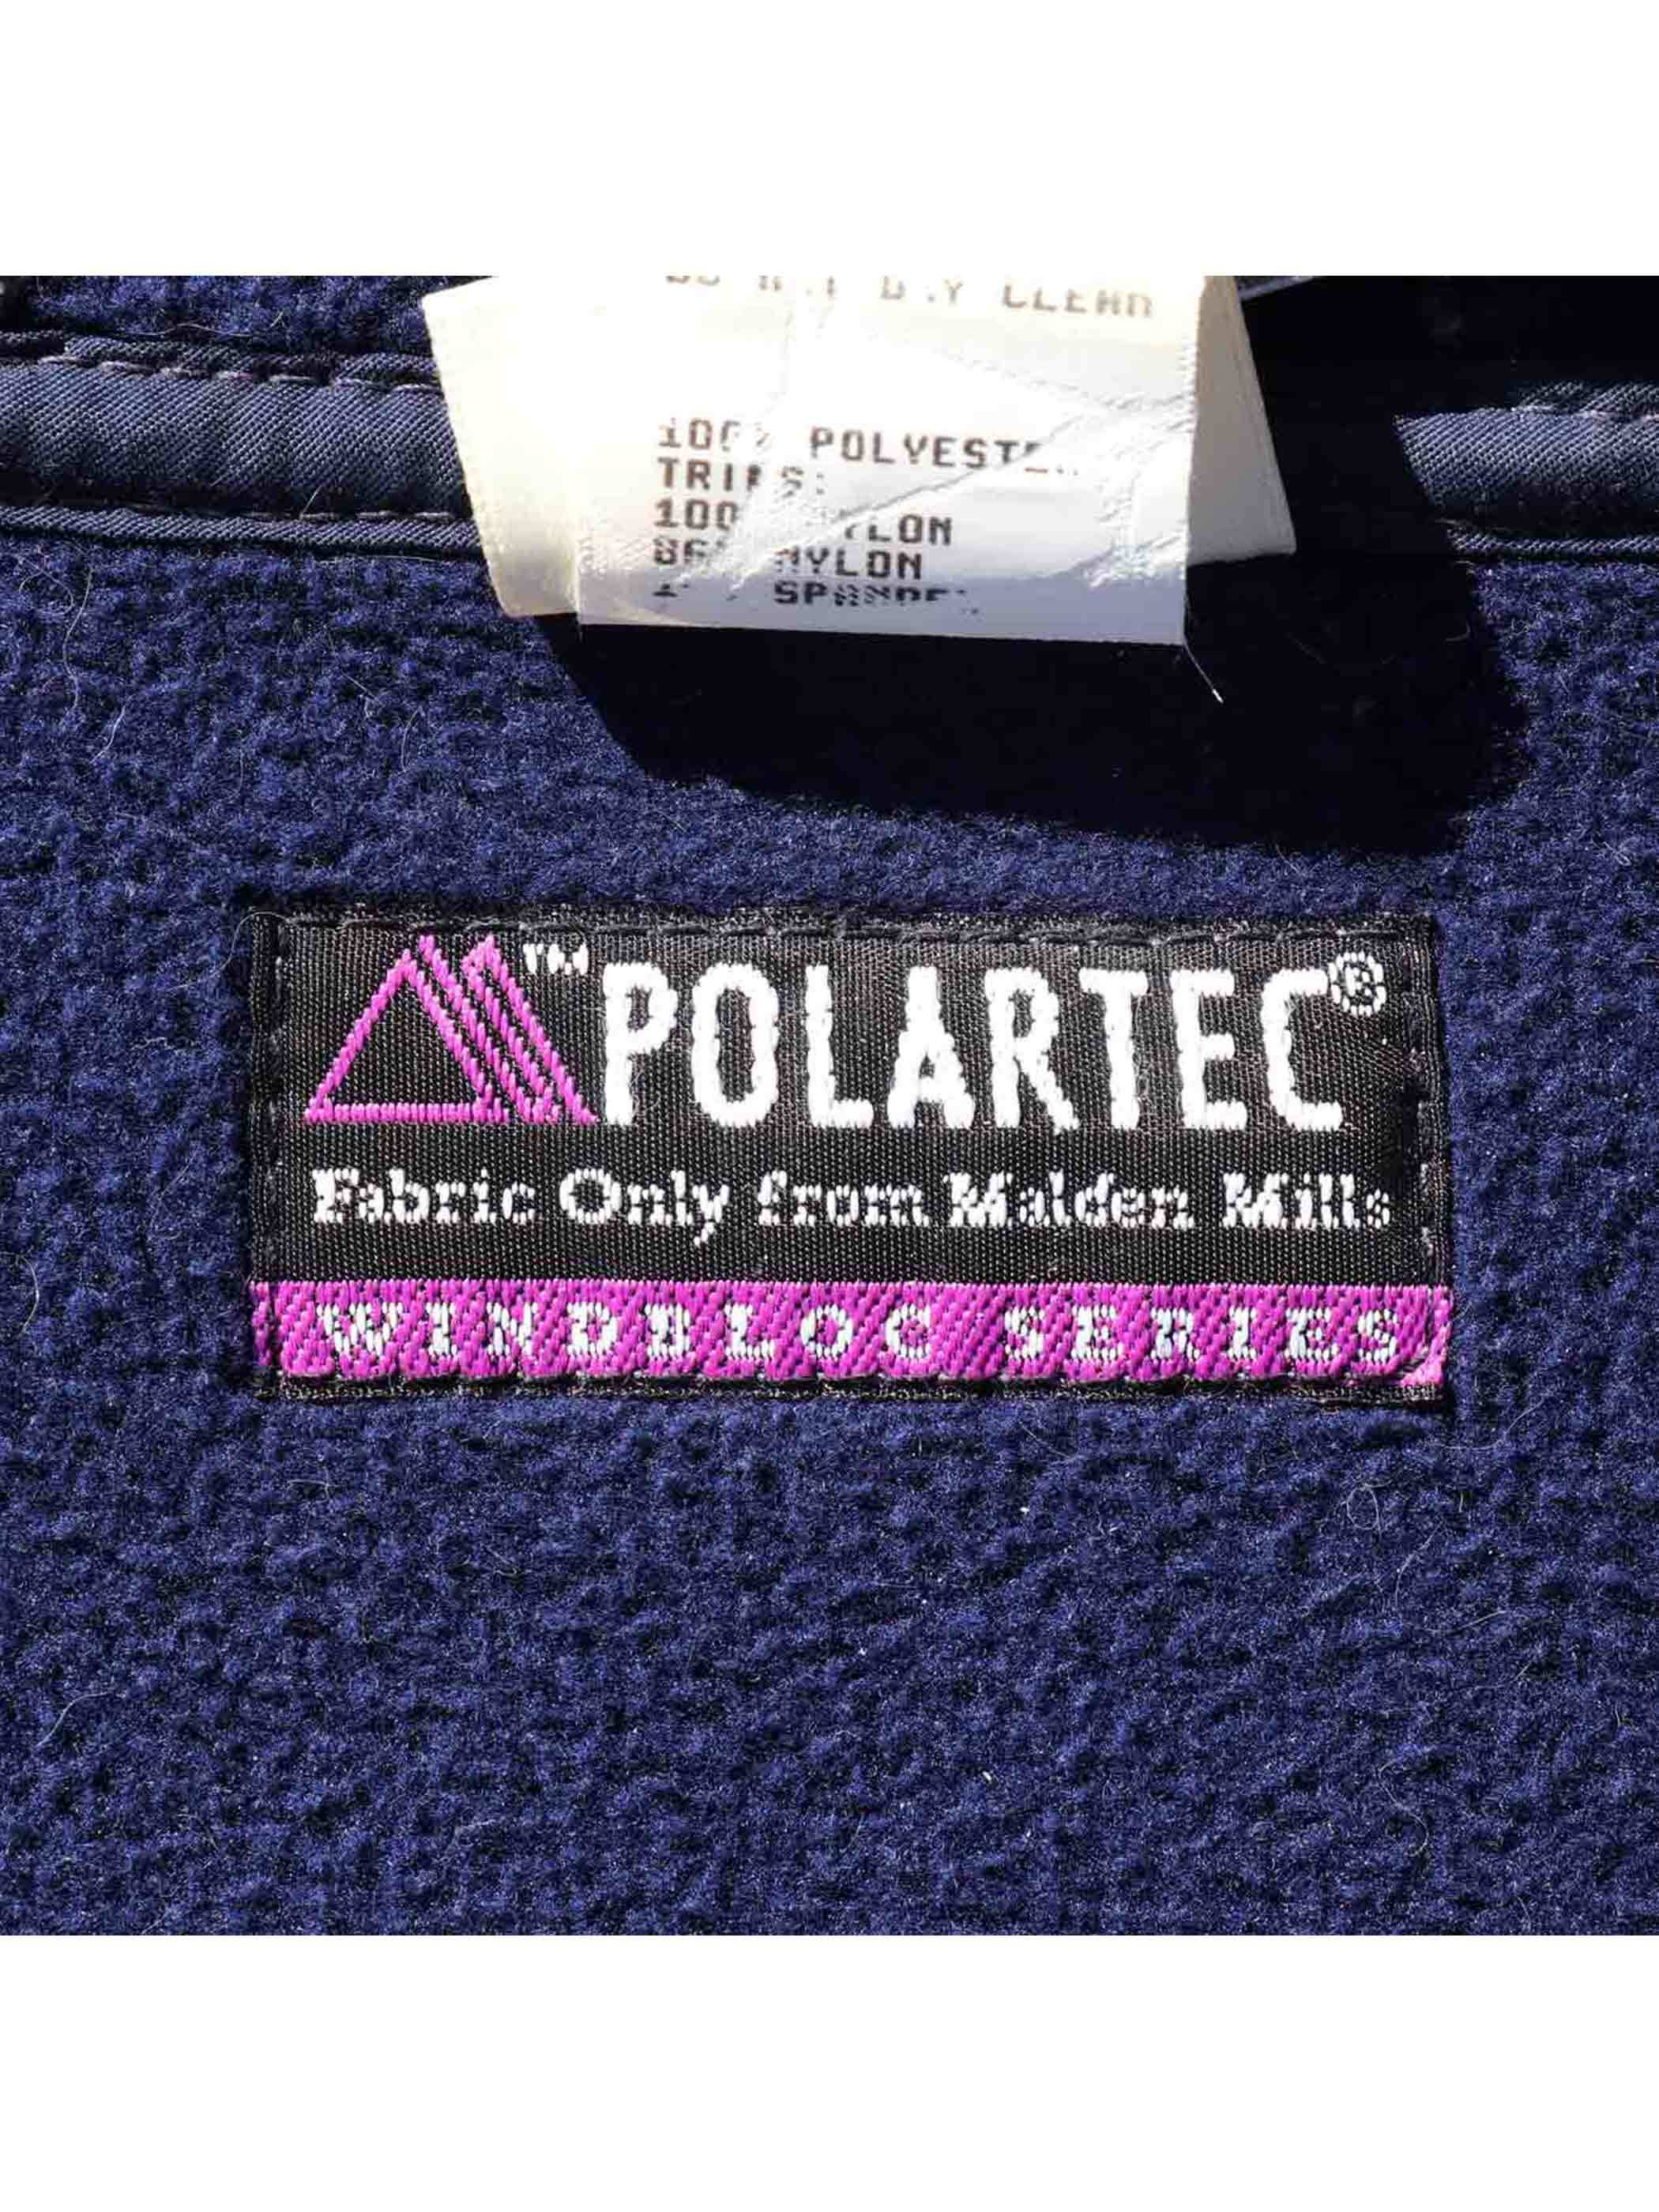 90's L.L.BEAN USA製 POLARTEC フリースプルオーバージャケット [Women's M]